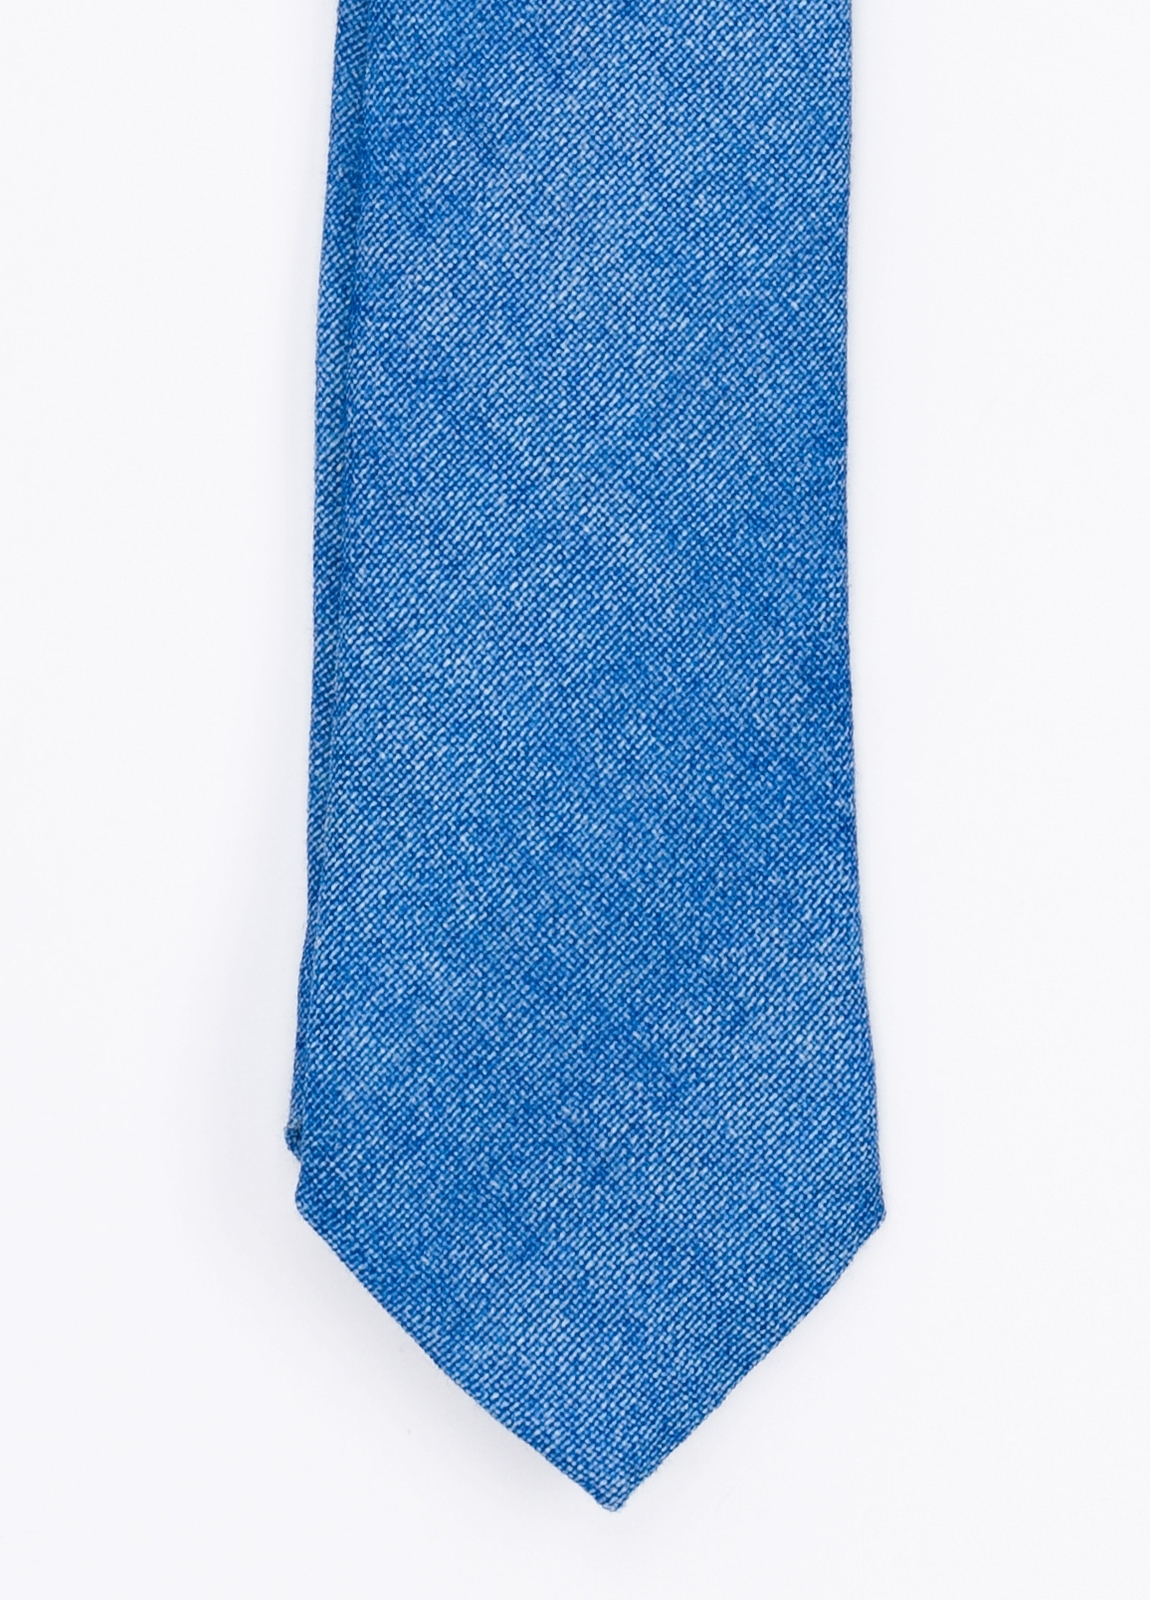 Corbata Formal Wear microtextura, color azul. Pala 7,5 cm. 100% Lana.